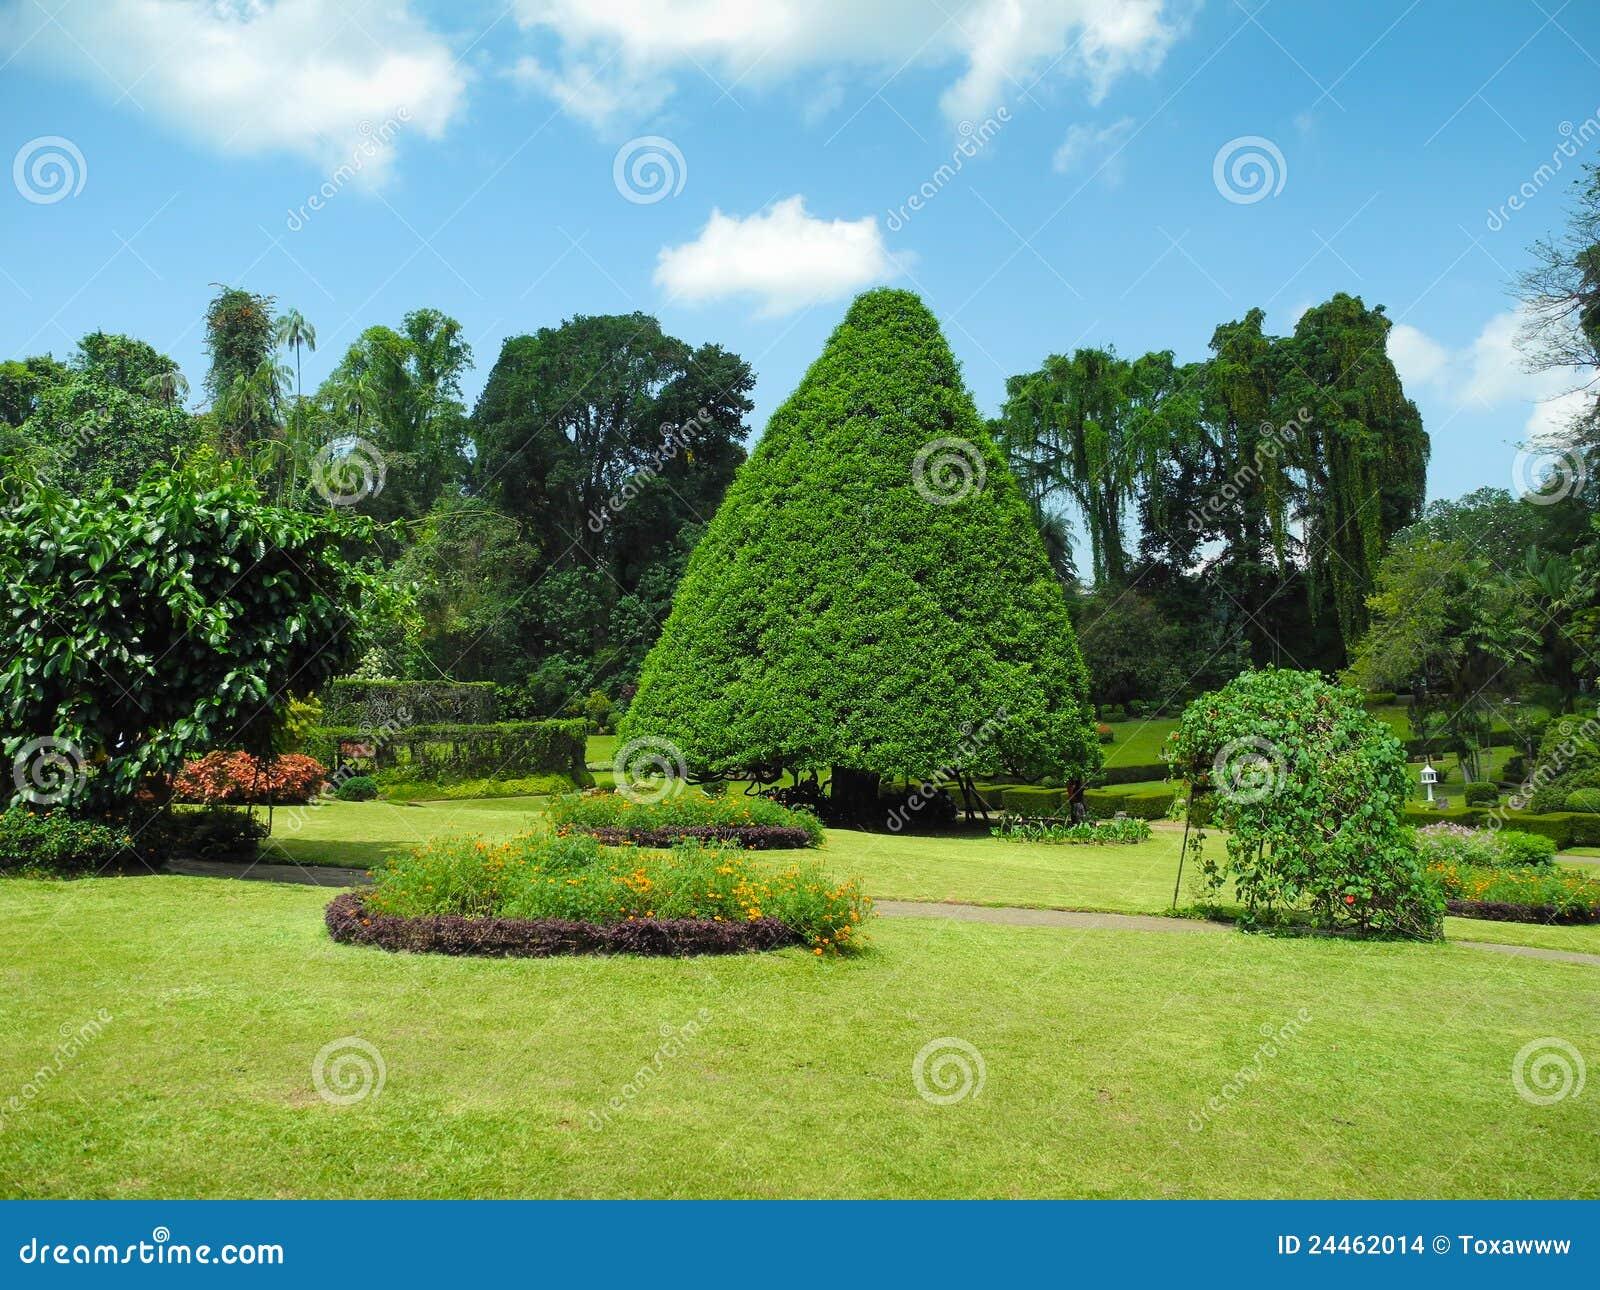 Garden Landscape peradeniya botanical garden landscape stock images - image: 24462014